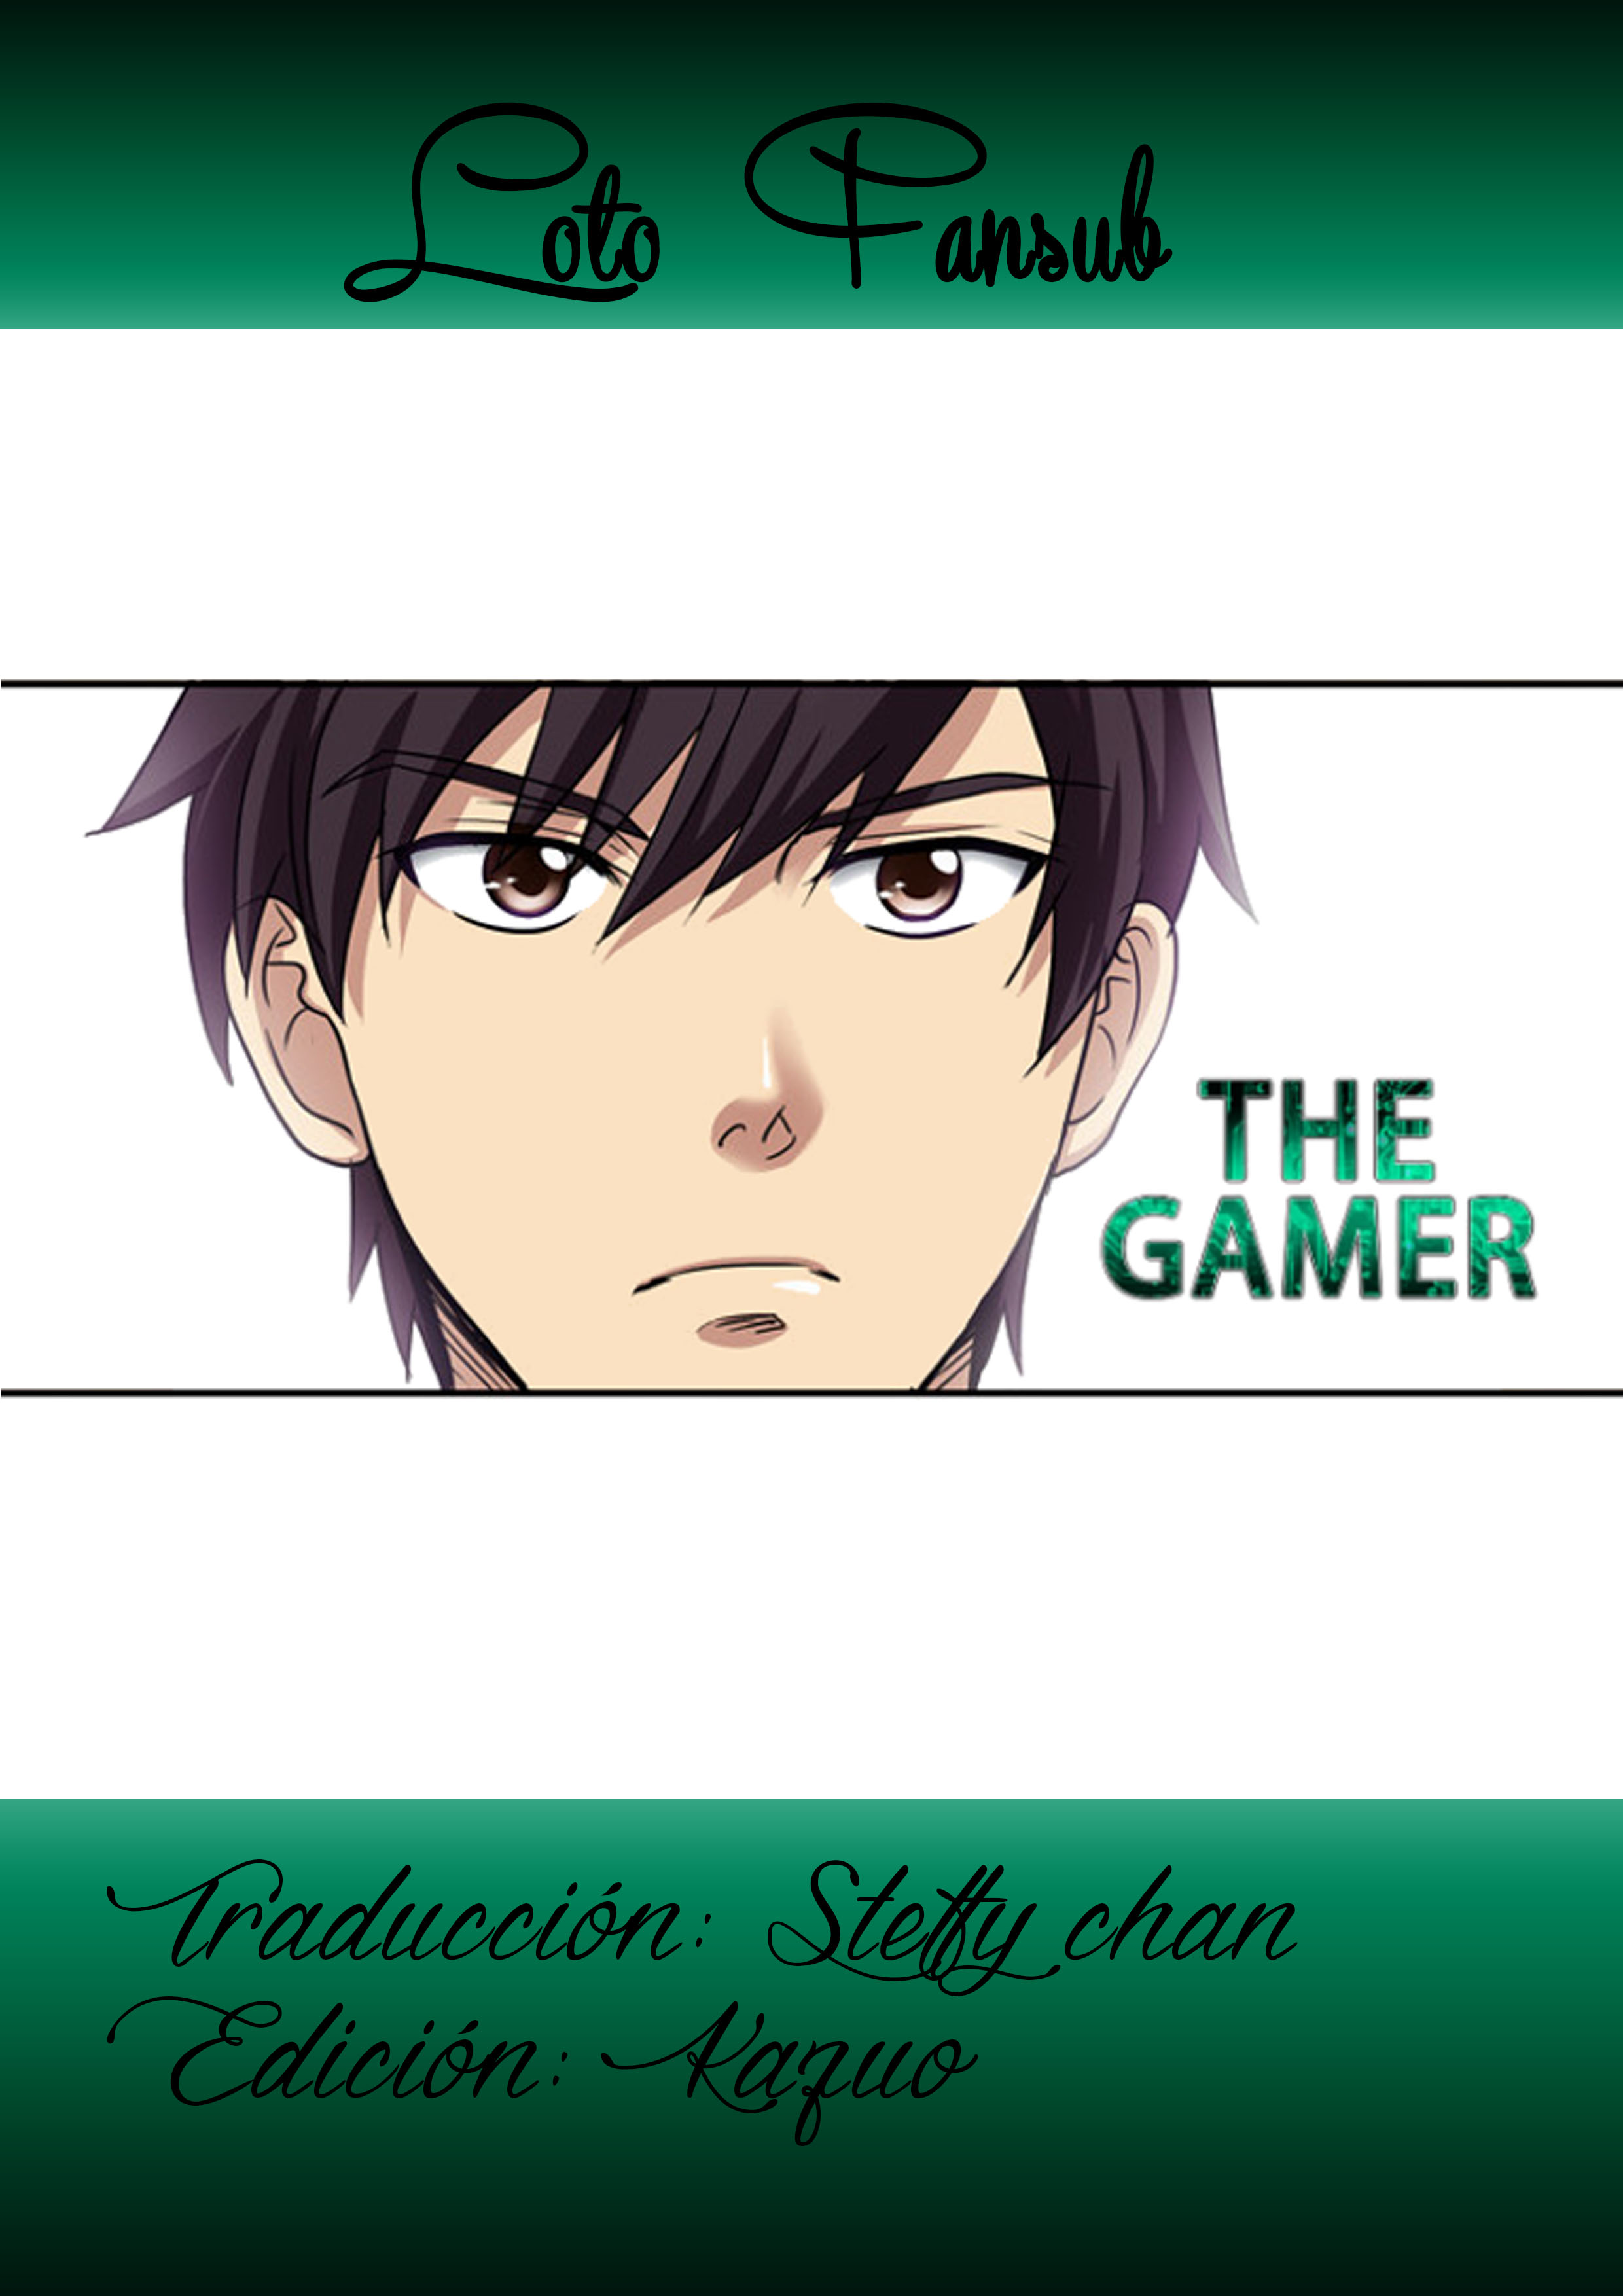 http://c5.ninemanga.com/es_manga/61/1725/434275/c76bc51d0f3ea1bcf59f0a537d213654.jpg Page 1